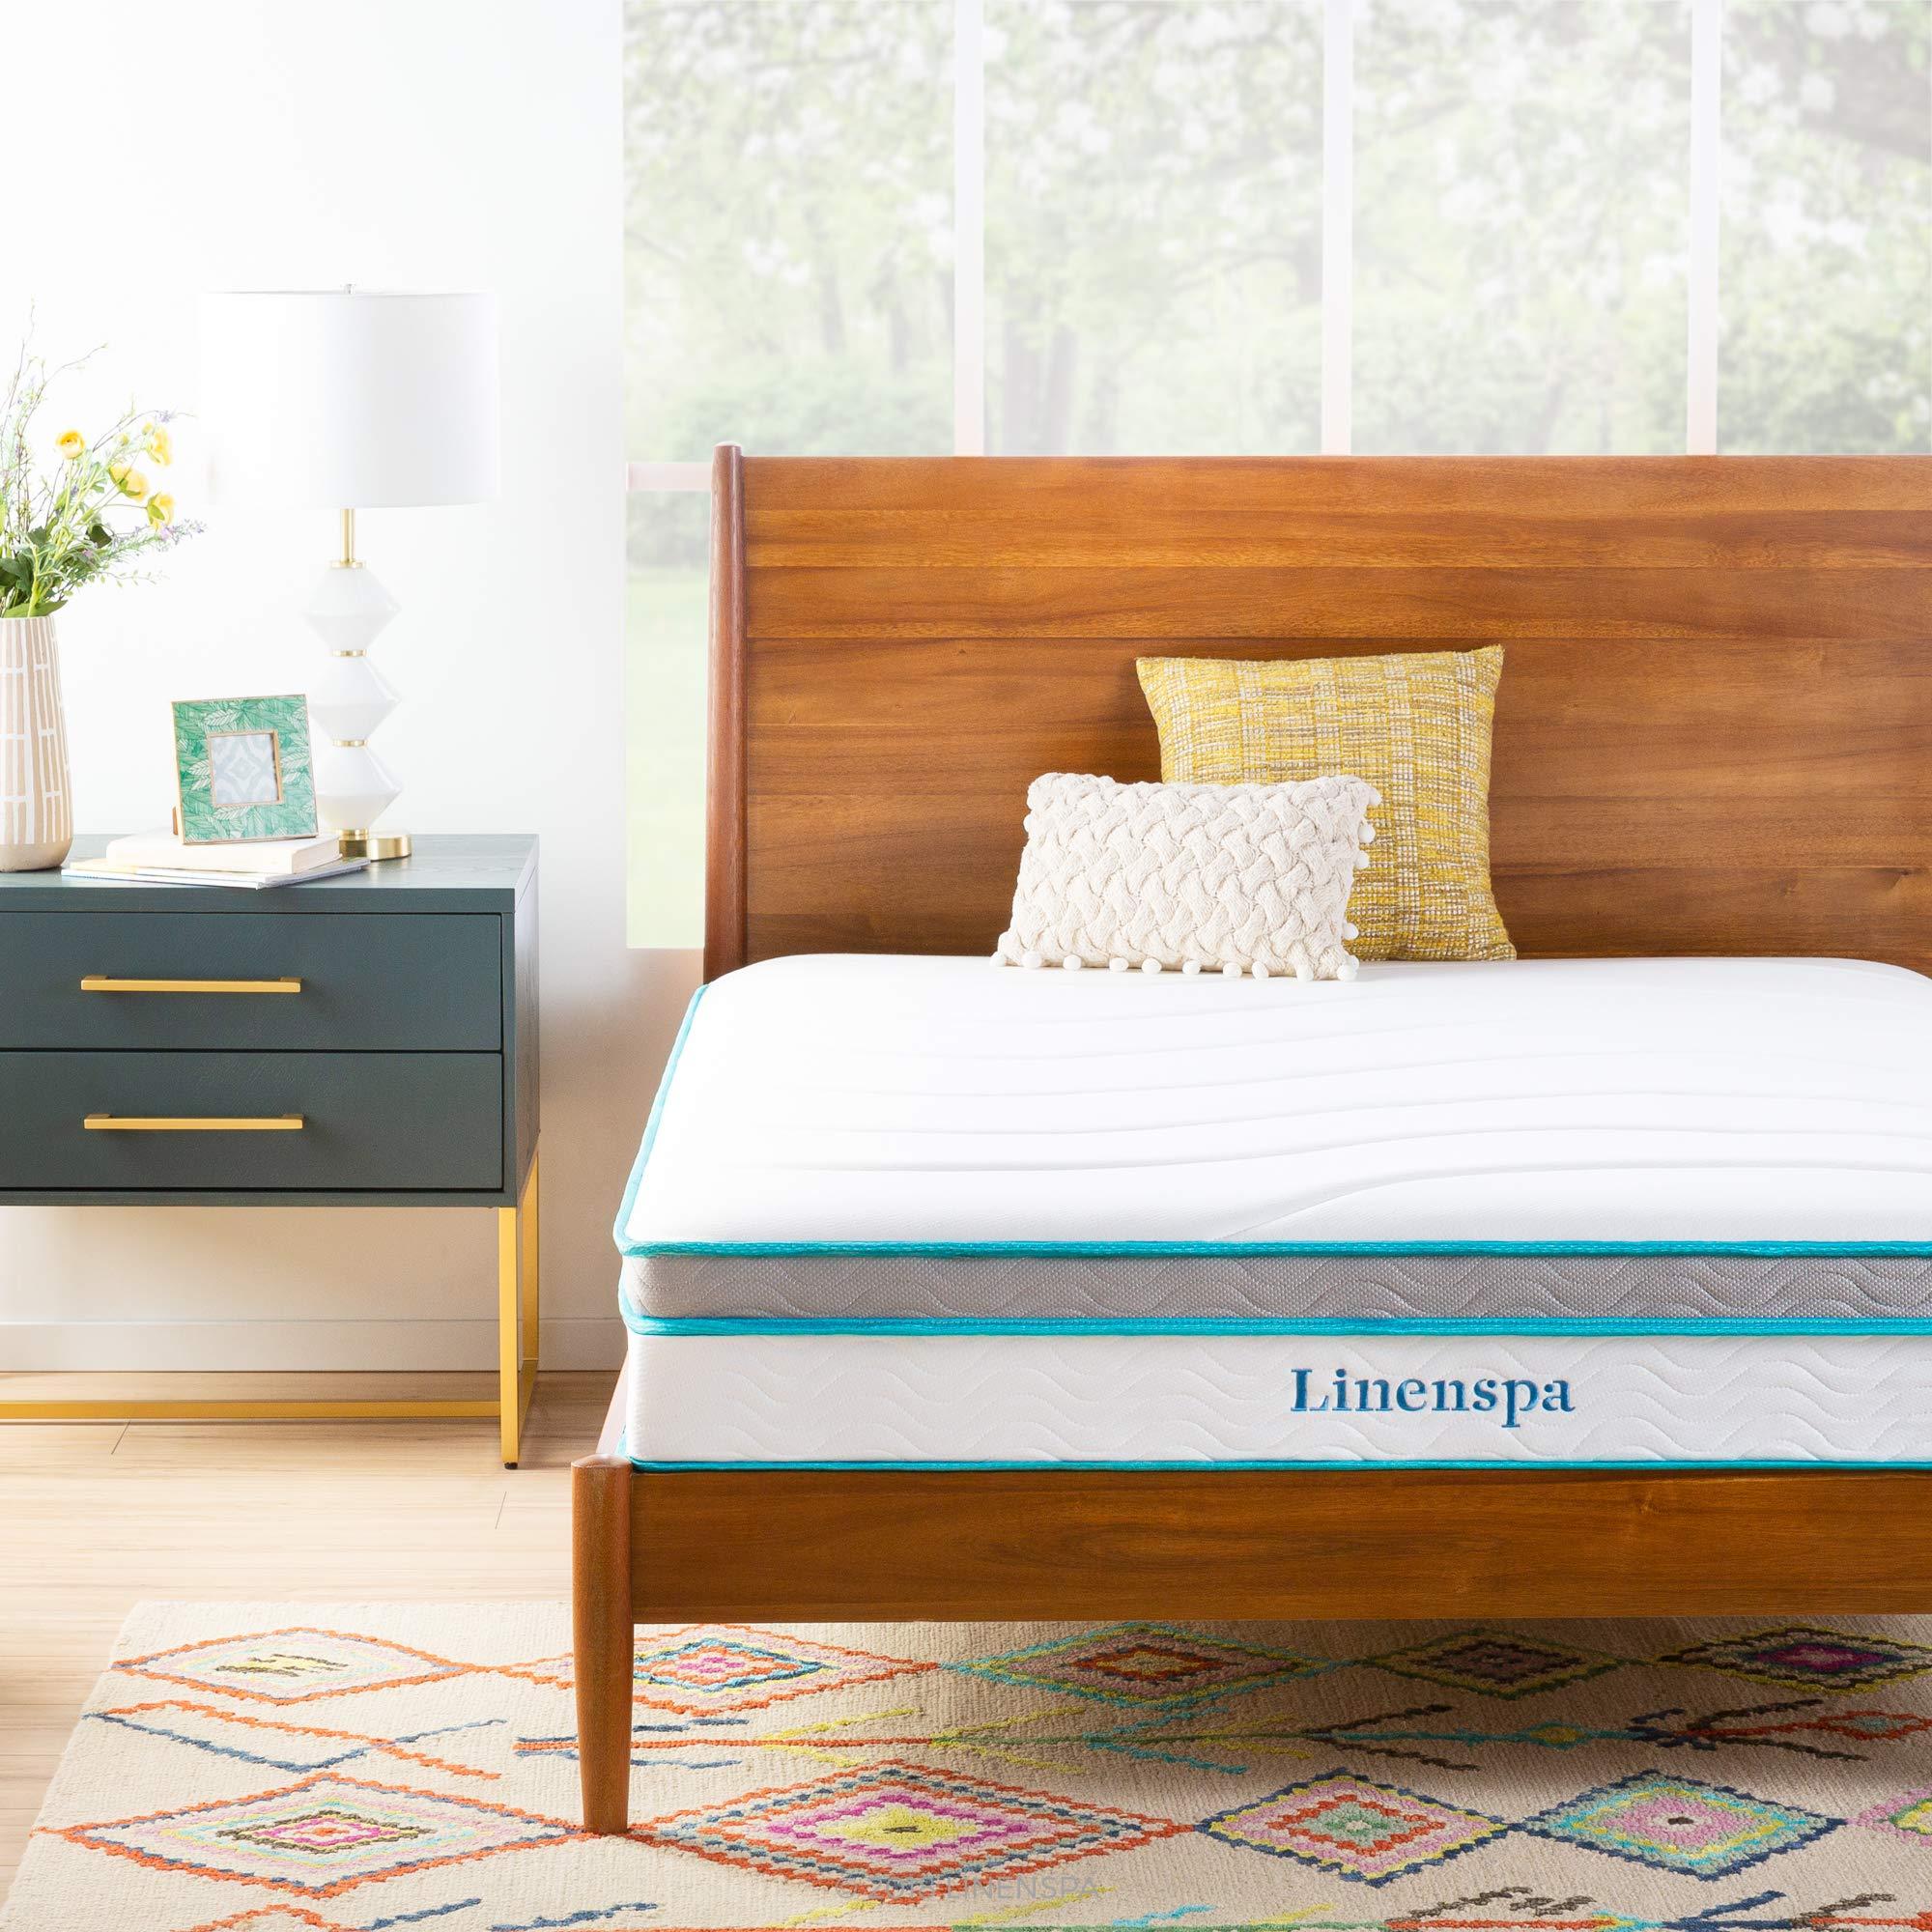 Linenspa + Memory Foam and Innerspring Hybrid Mattress